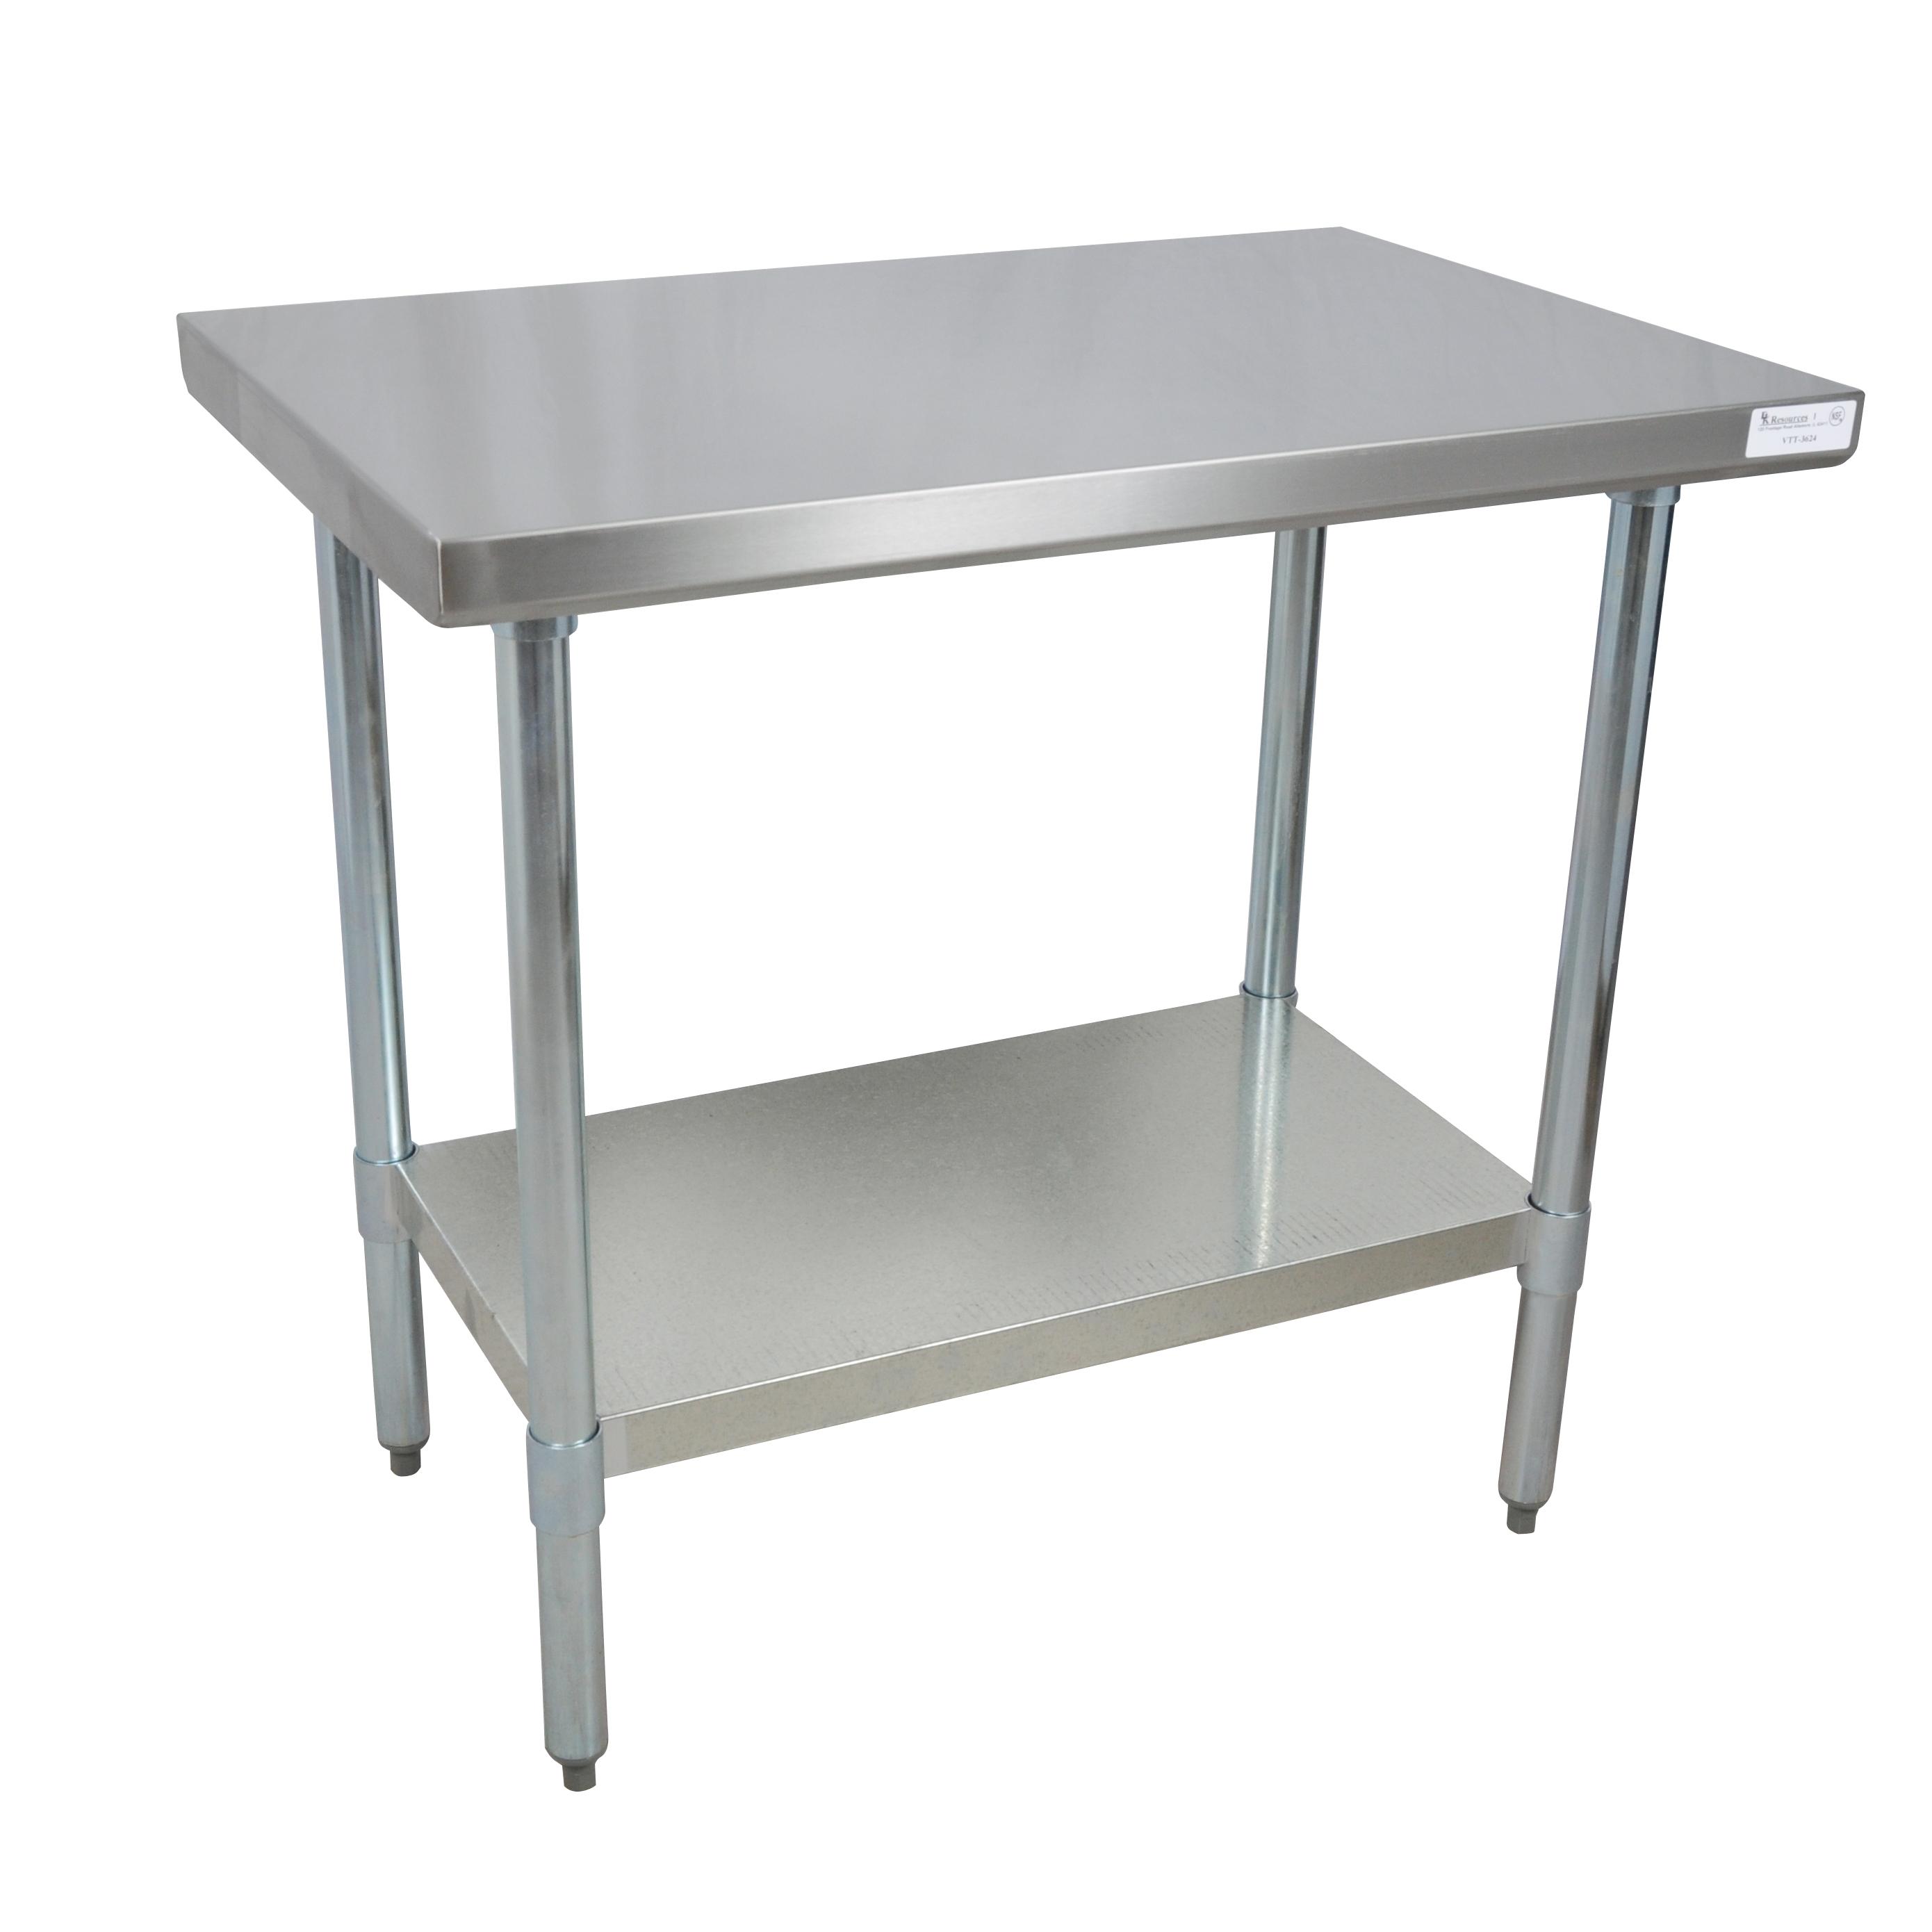 BK Resources CTT-7230 work table,  63